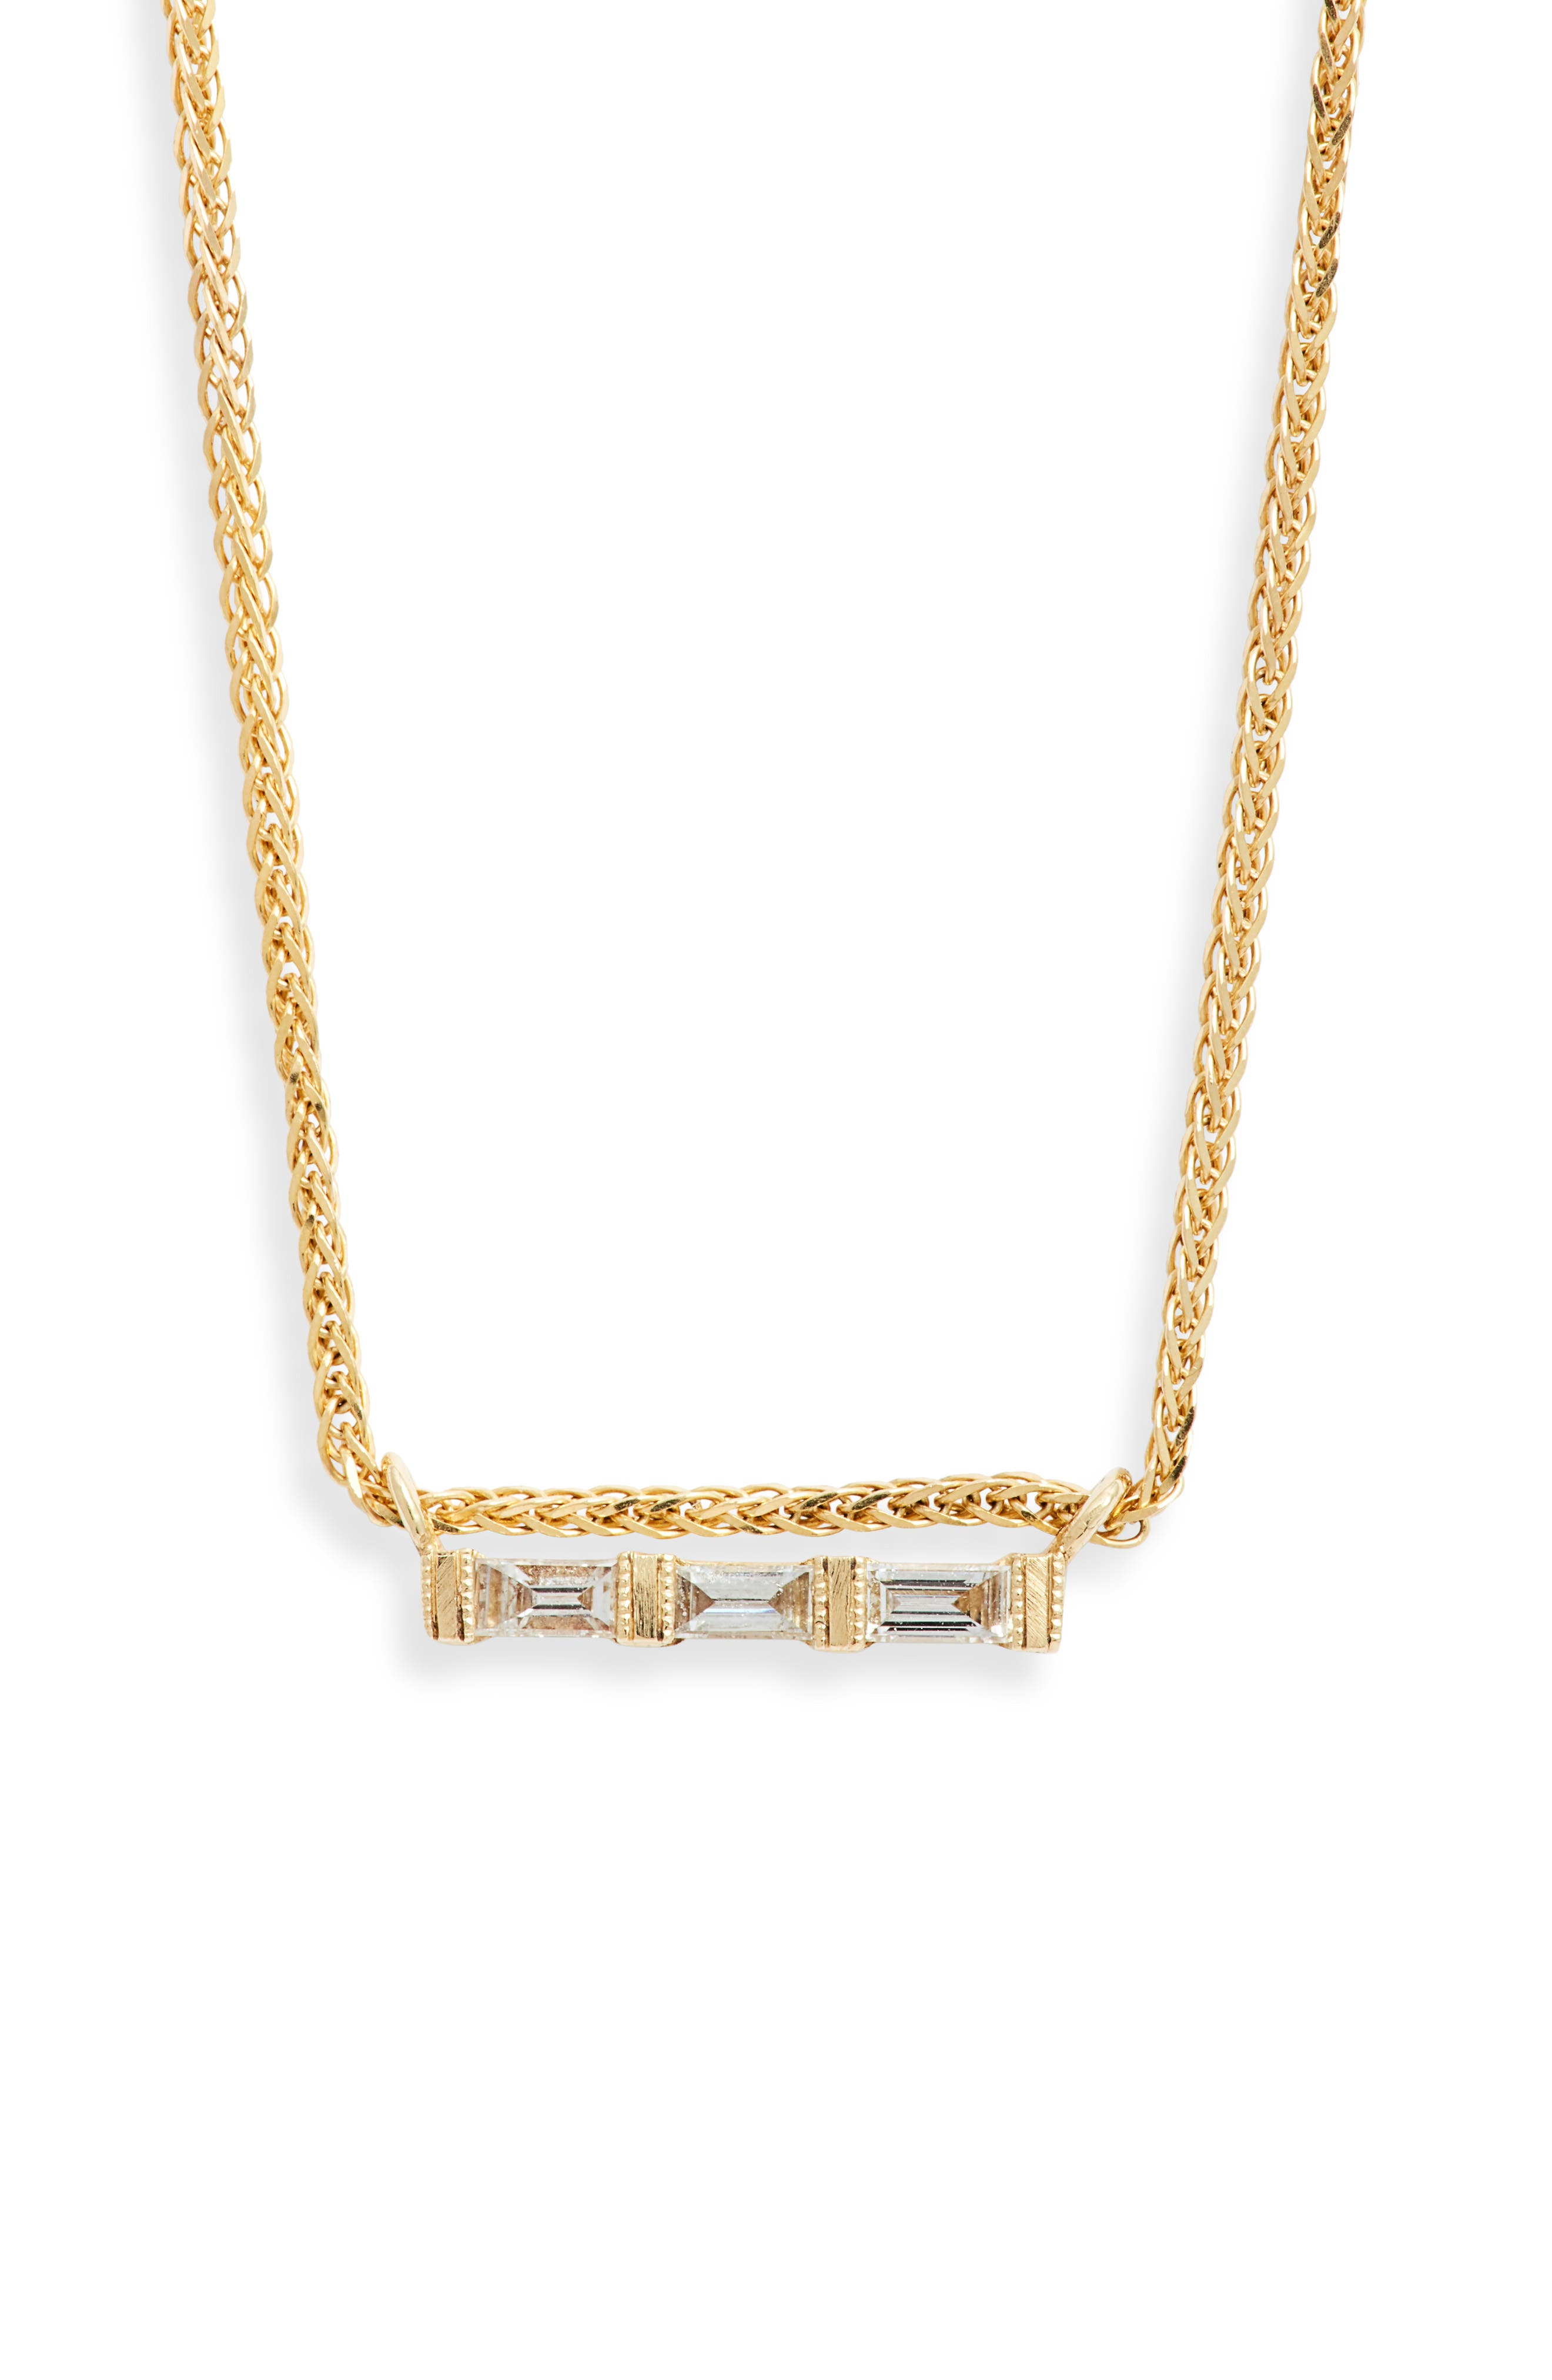 Three Diamond Baguette Necklace